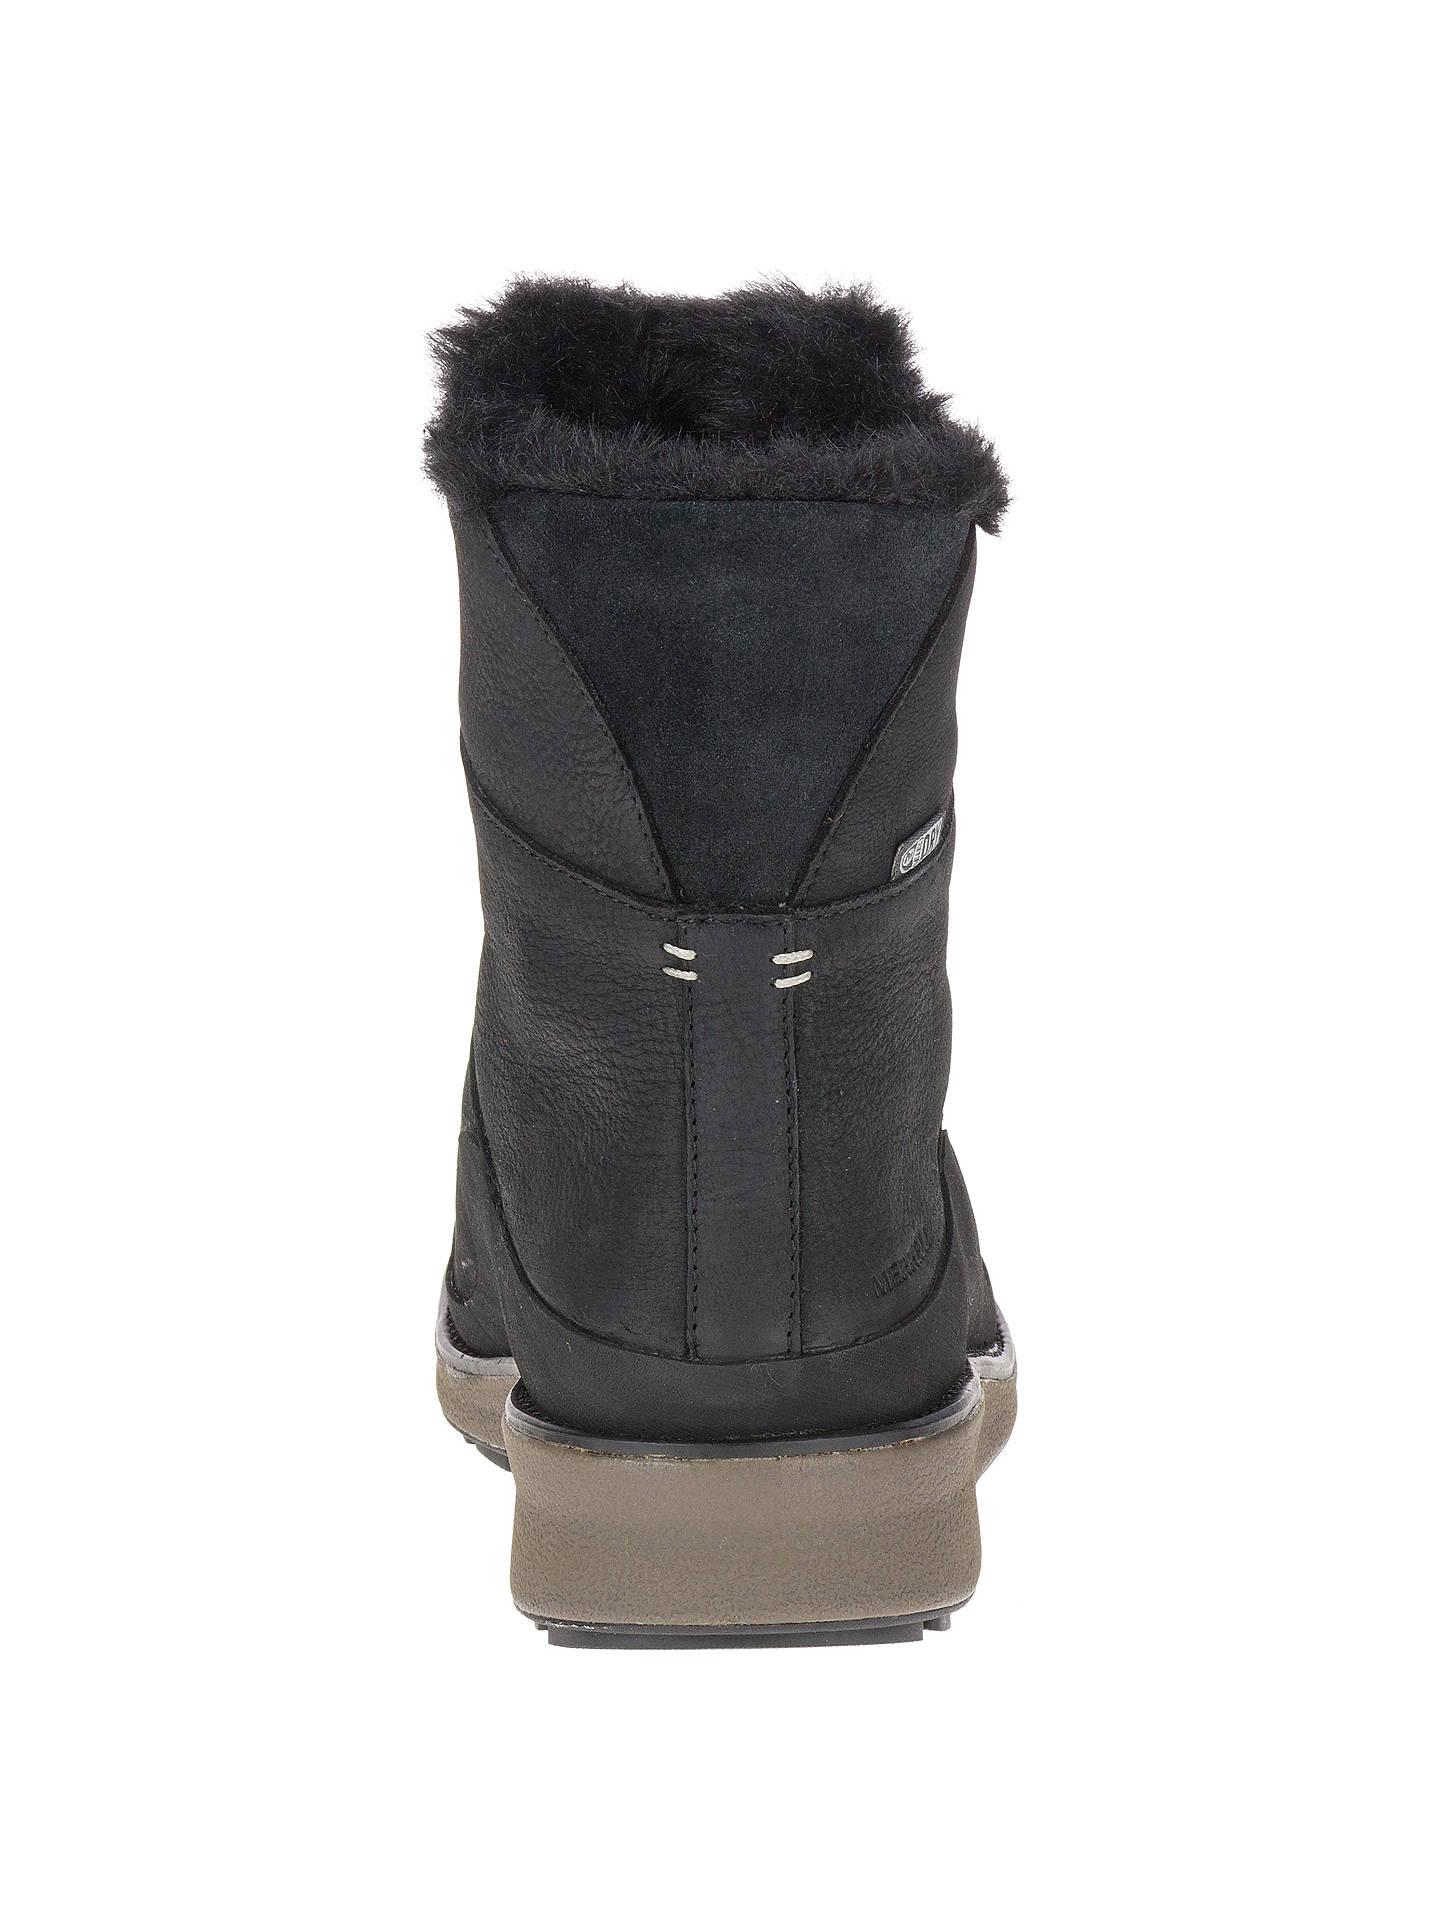 1c1d259e Merrell Tremblant Ezra Walking Boots, Black at John Lewis & Partners